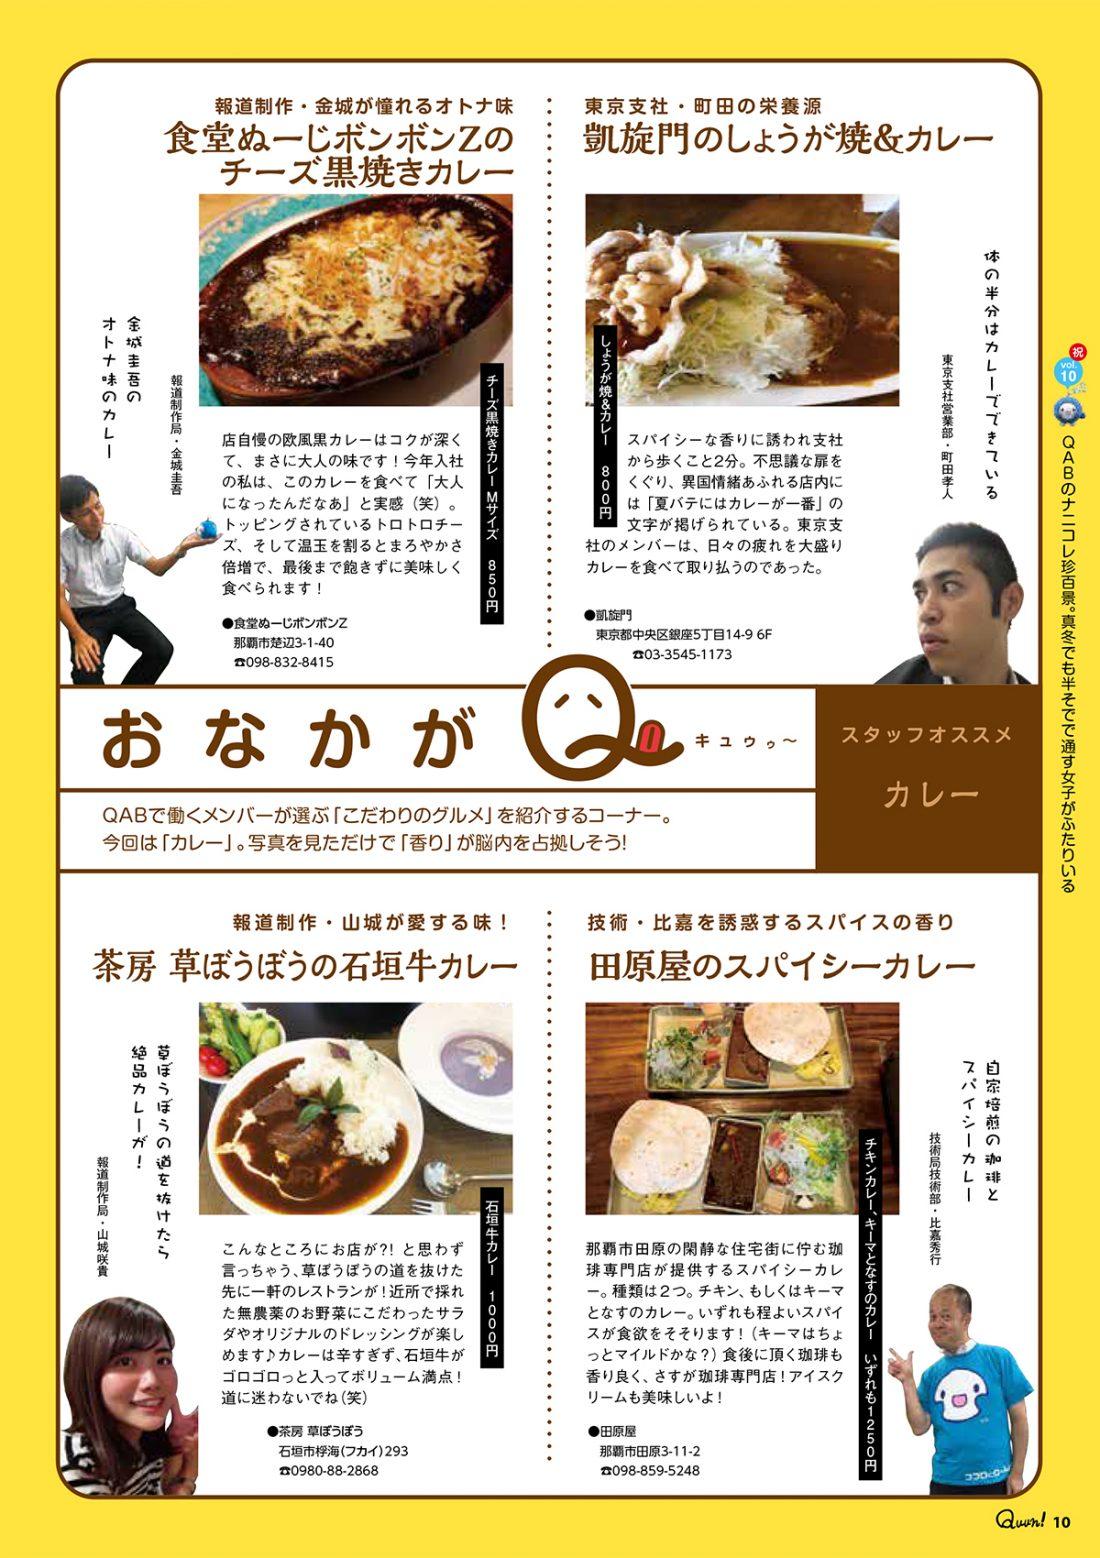 http://www.qab.co.jp/qgoro/wp-content/uploads/quun_1012-1100x1558.jpg